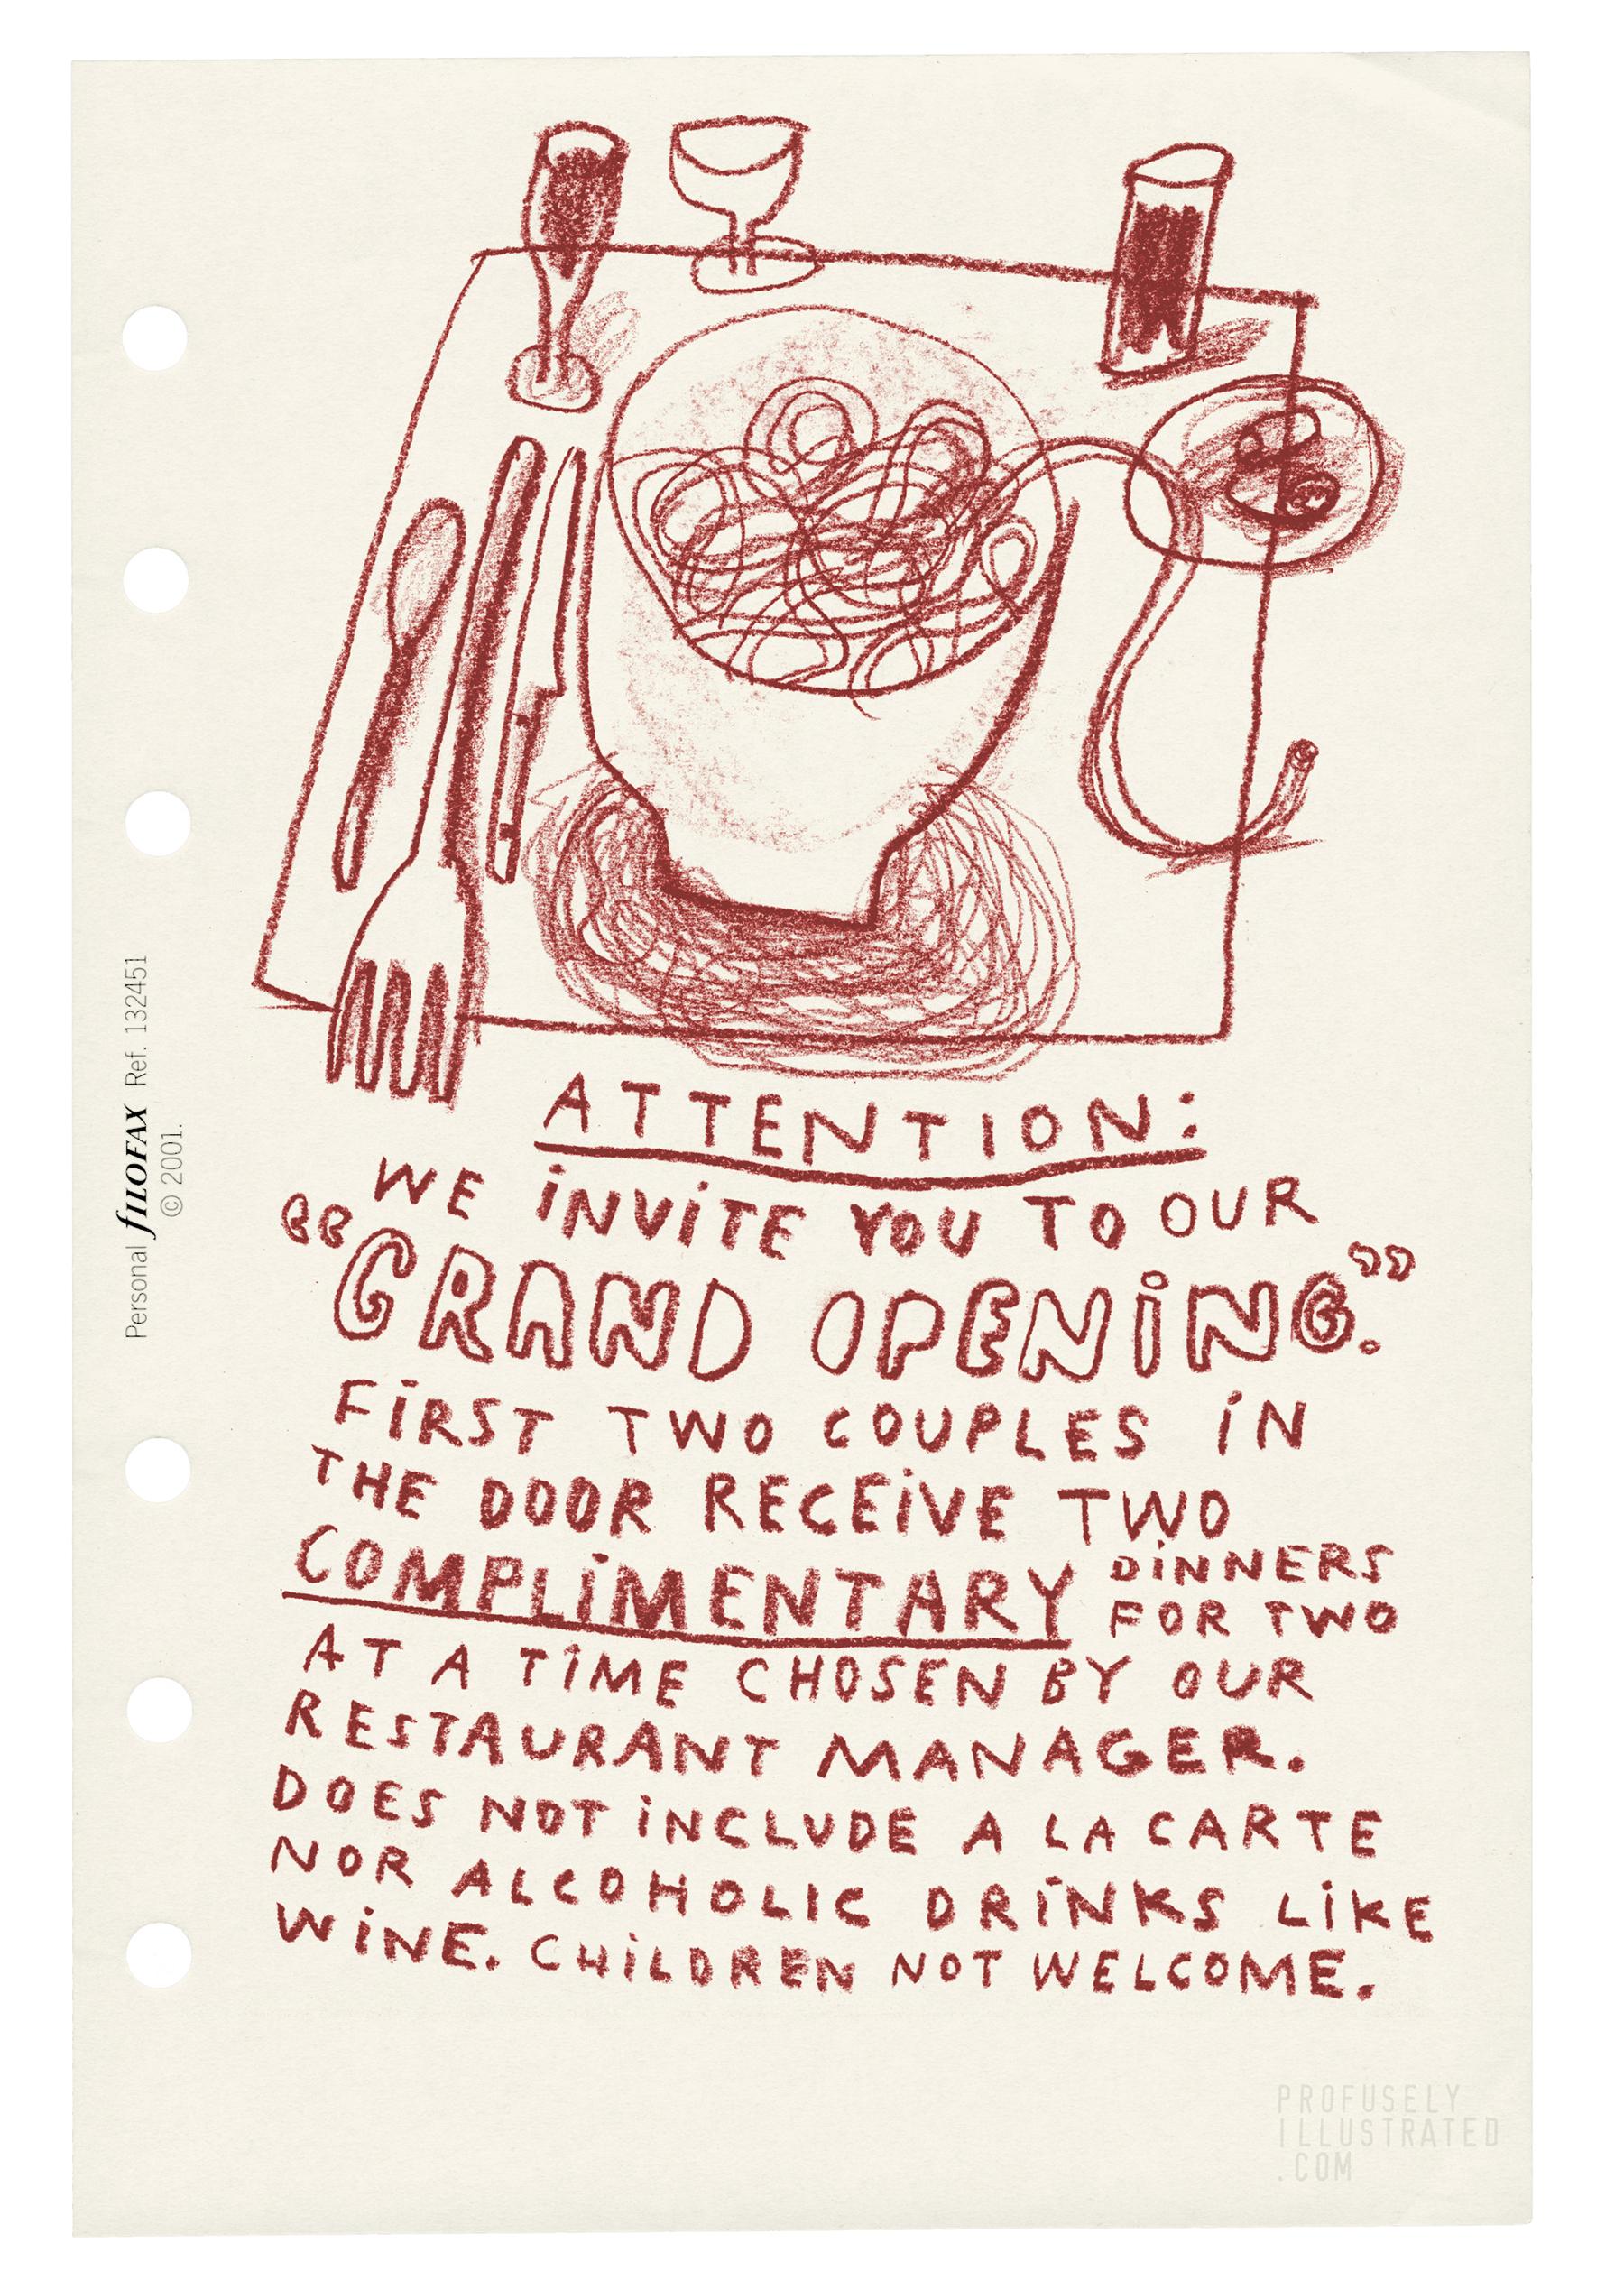 note to self #110 david mackintosh